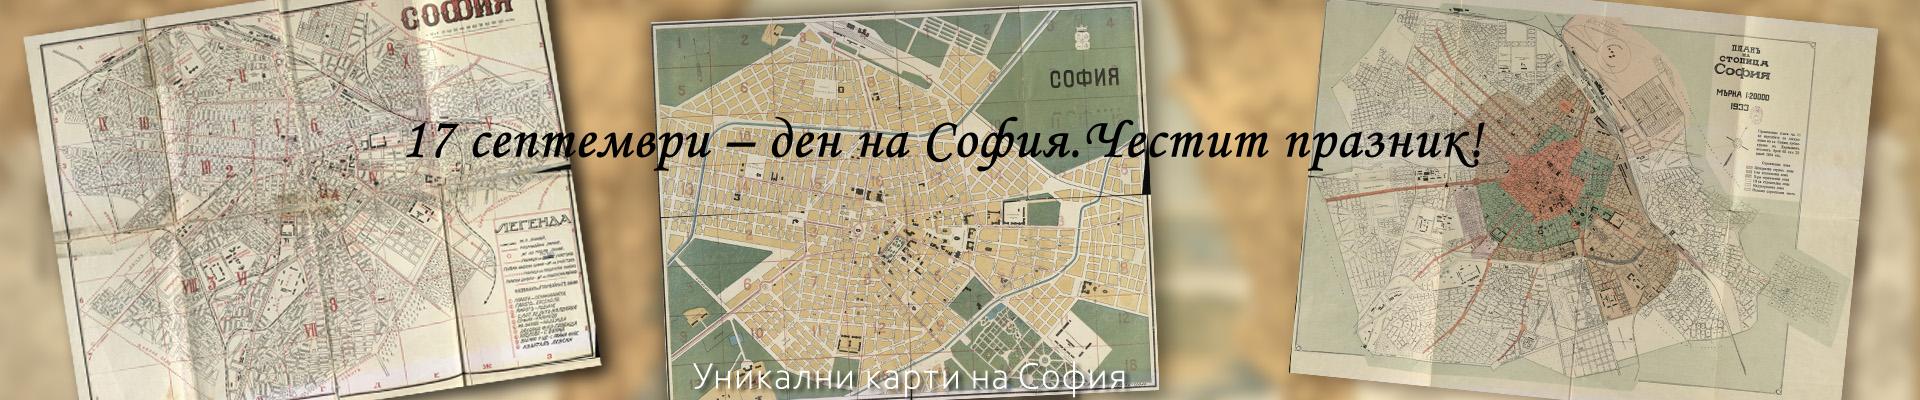 Уникални карти на София